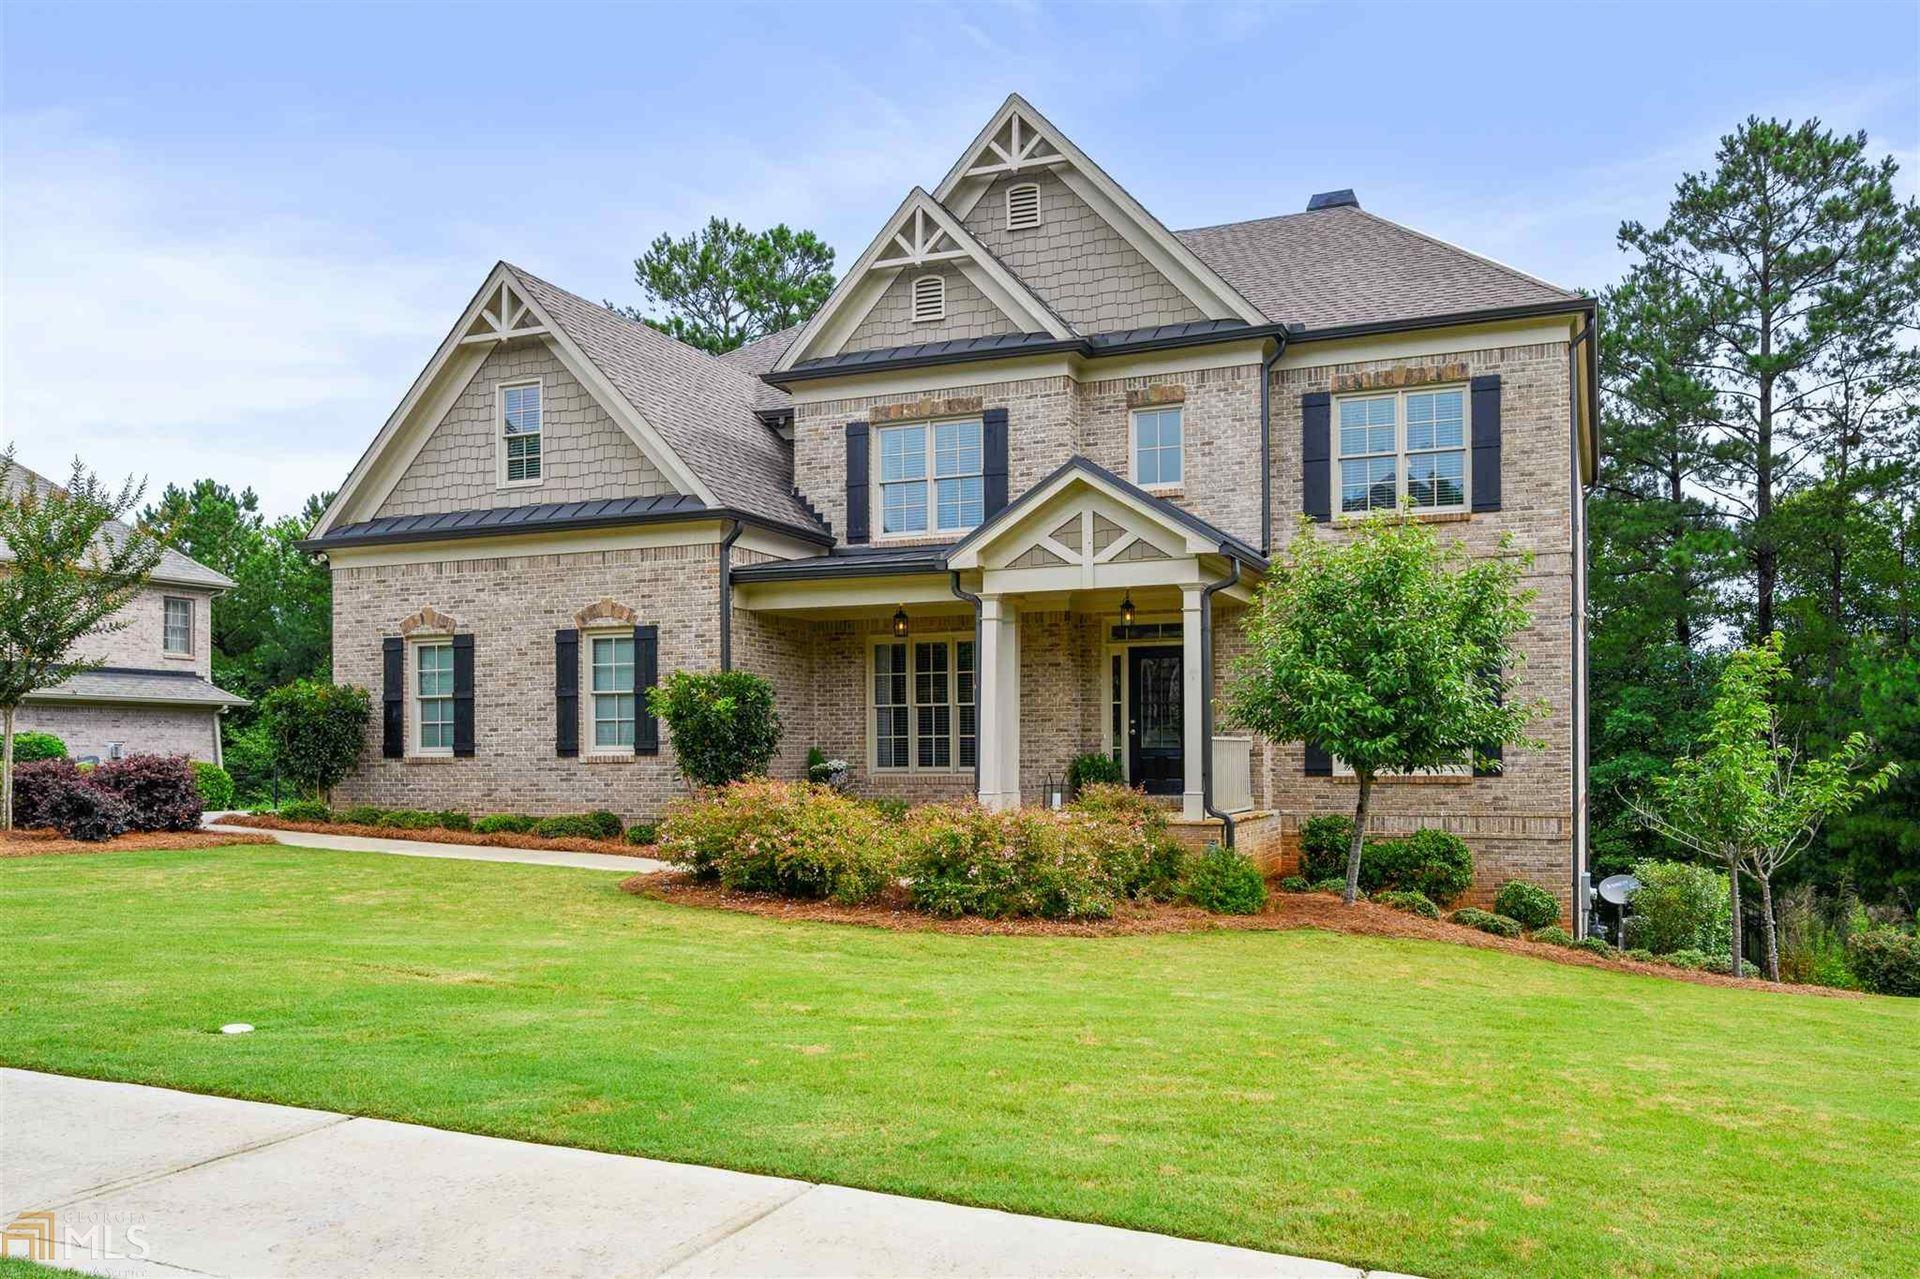 391 Estates View Dr, Acworth, GA 30101 - MLS#: 8813897